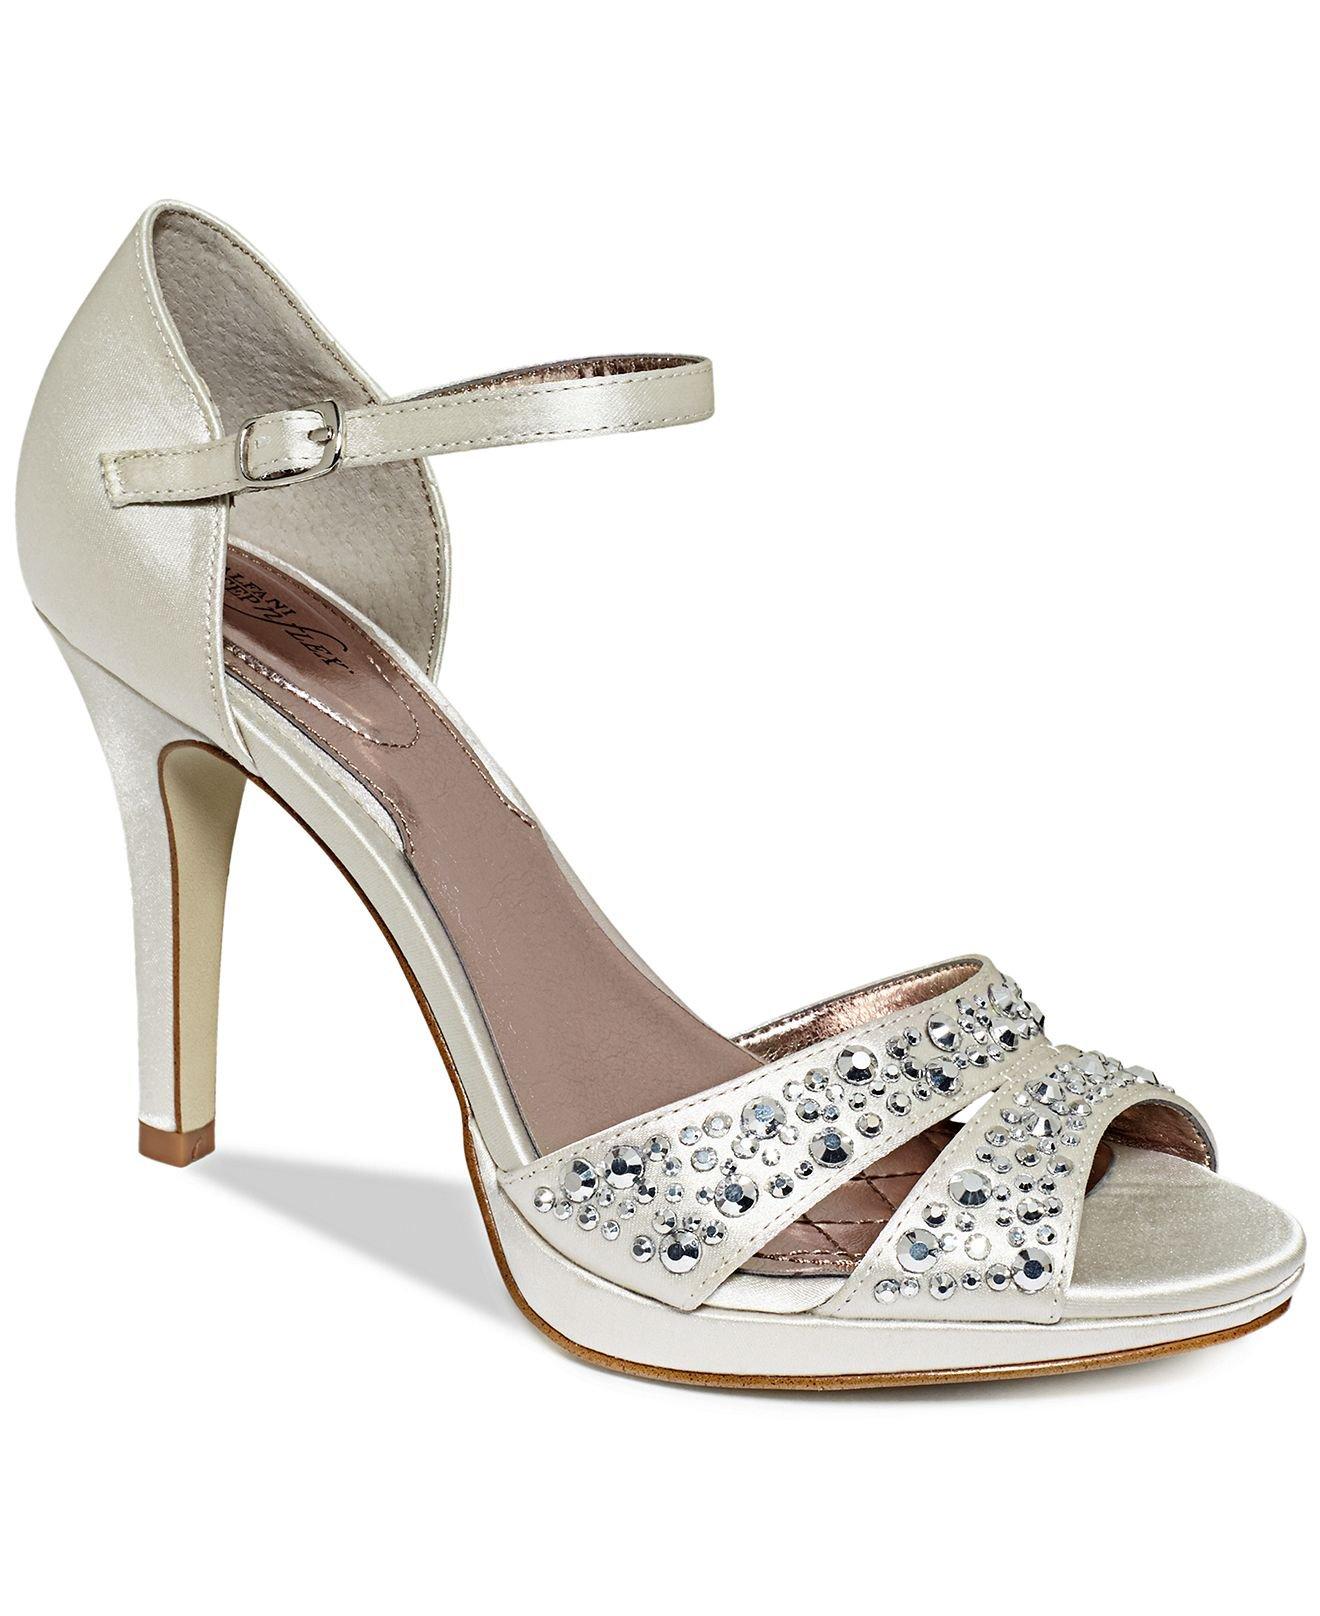 Macys Sell: Women's Shoes : Woman Fashion